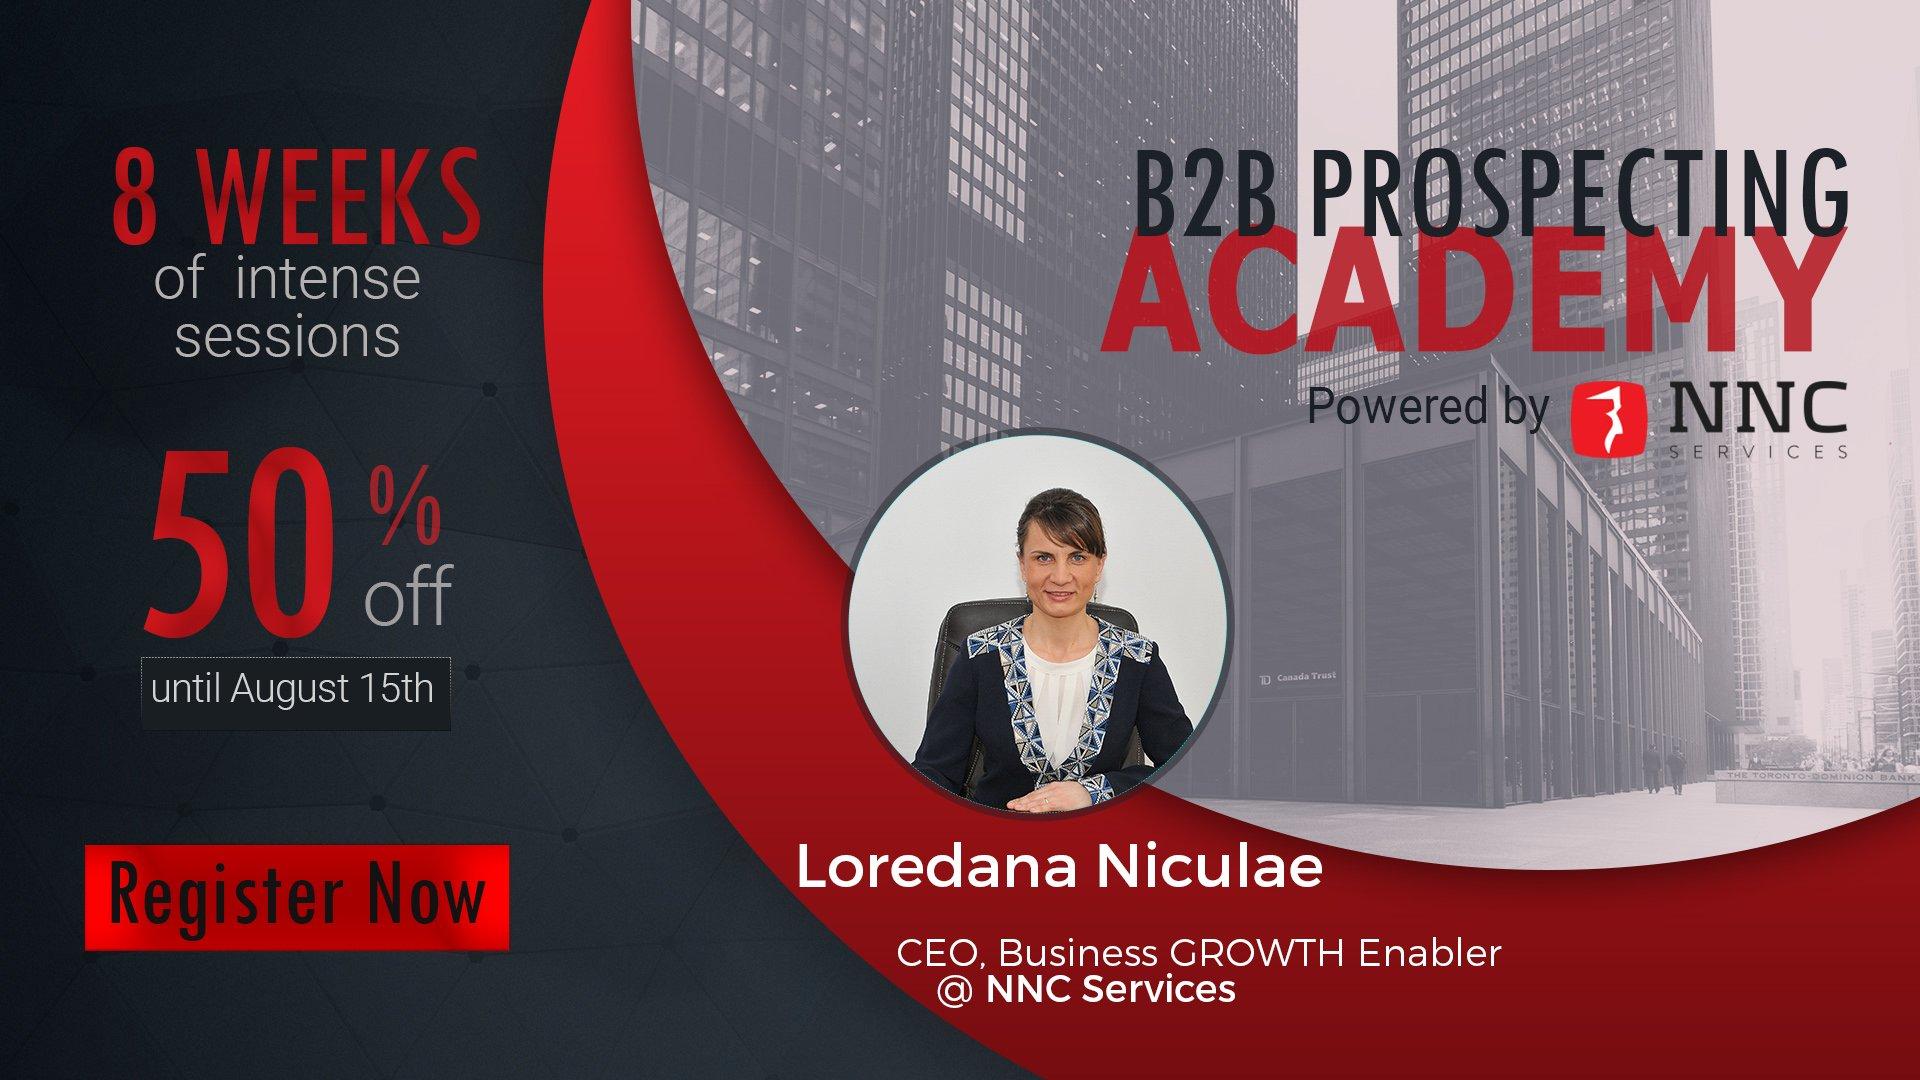 b2b prospecting academy